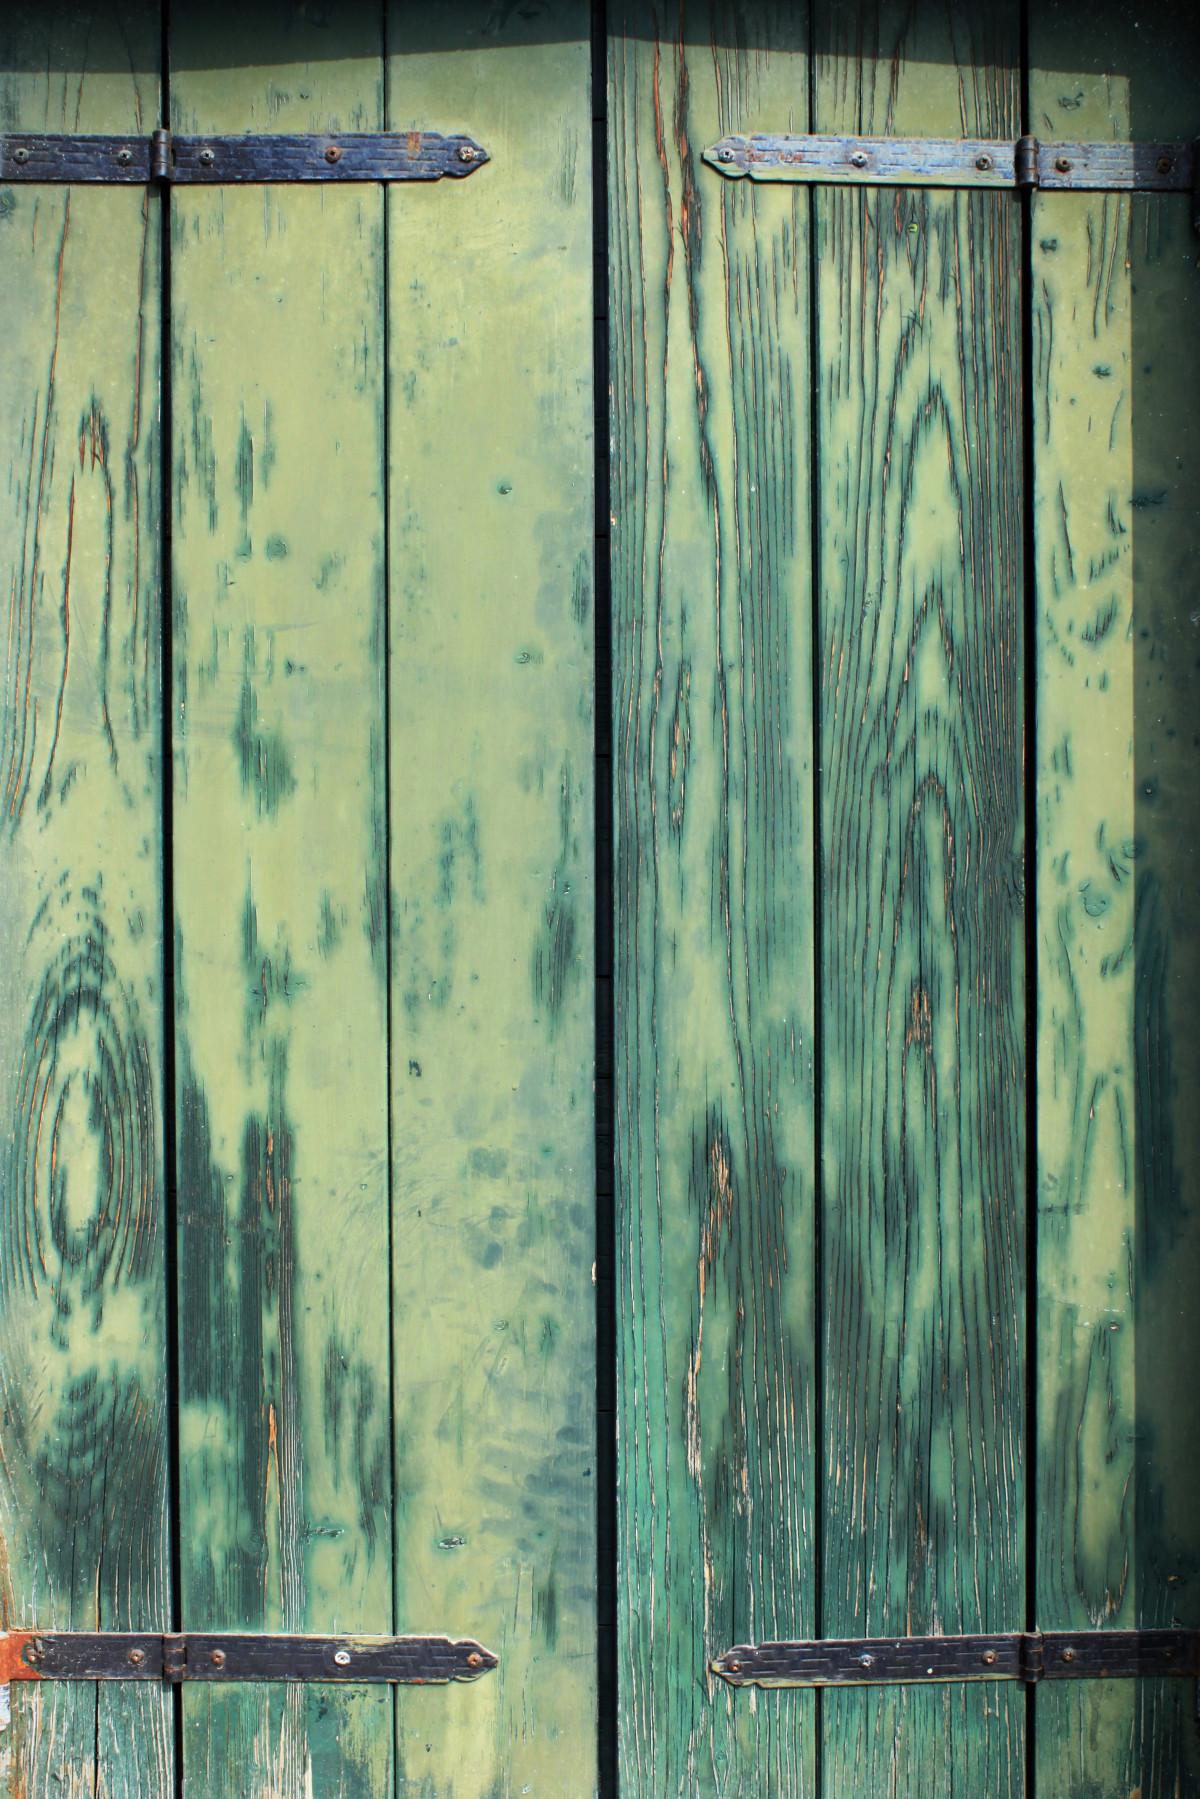 Fotos gratis : madera, casa, textura, pared, moho, verde ...